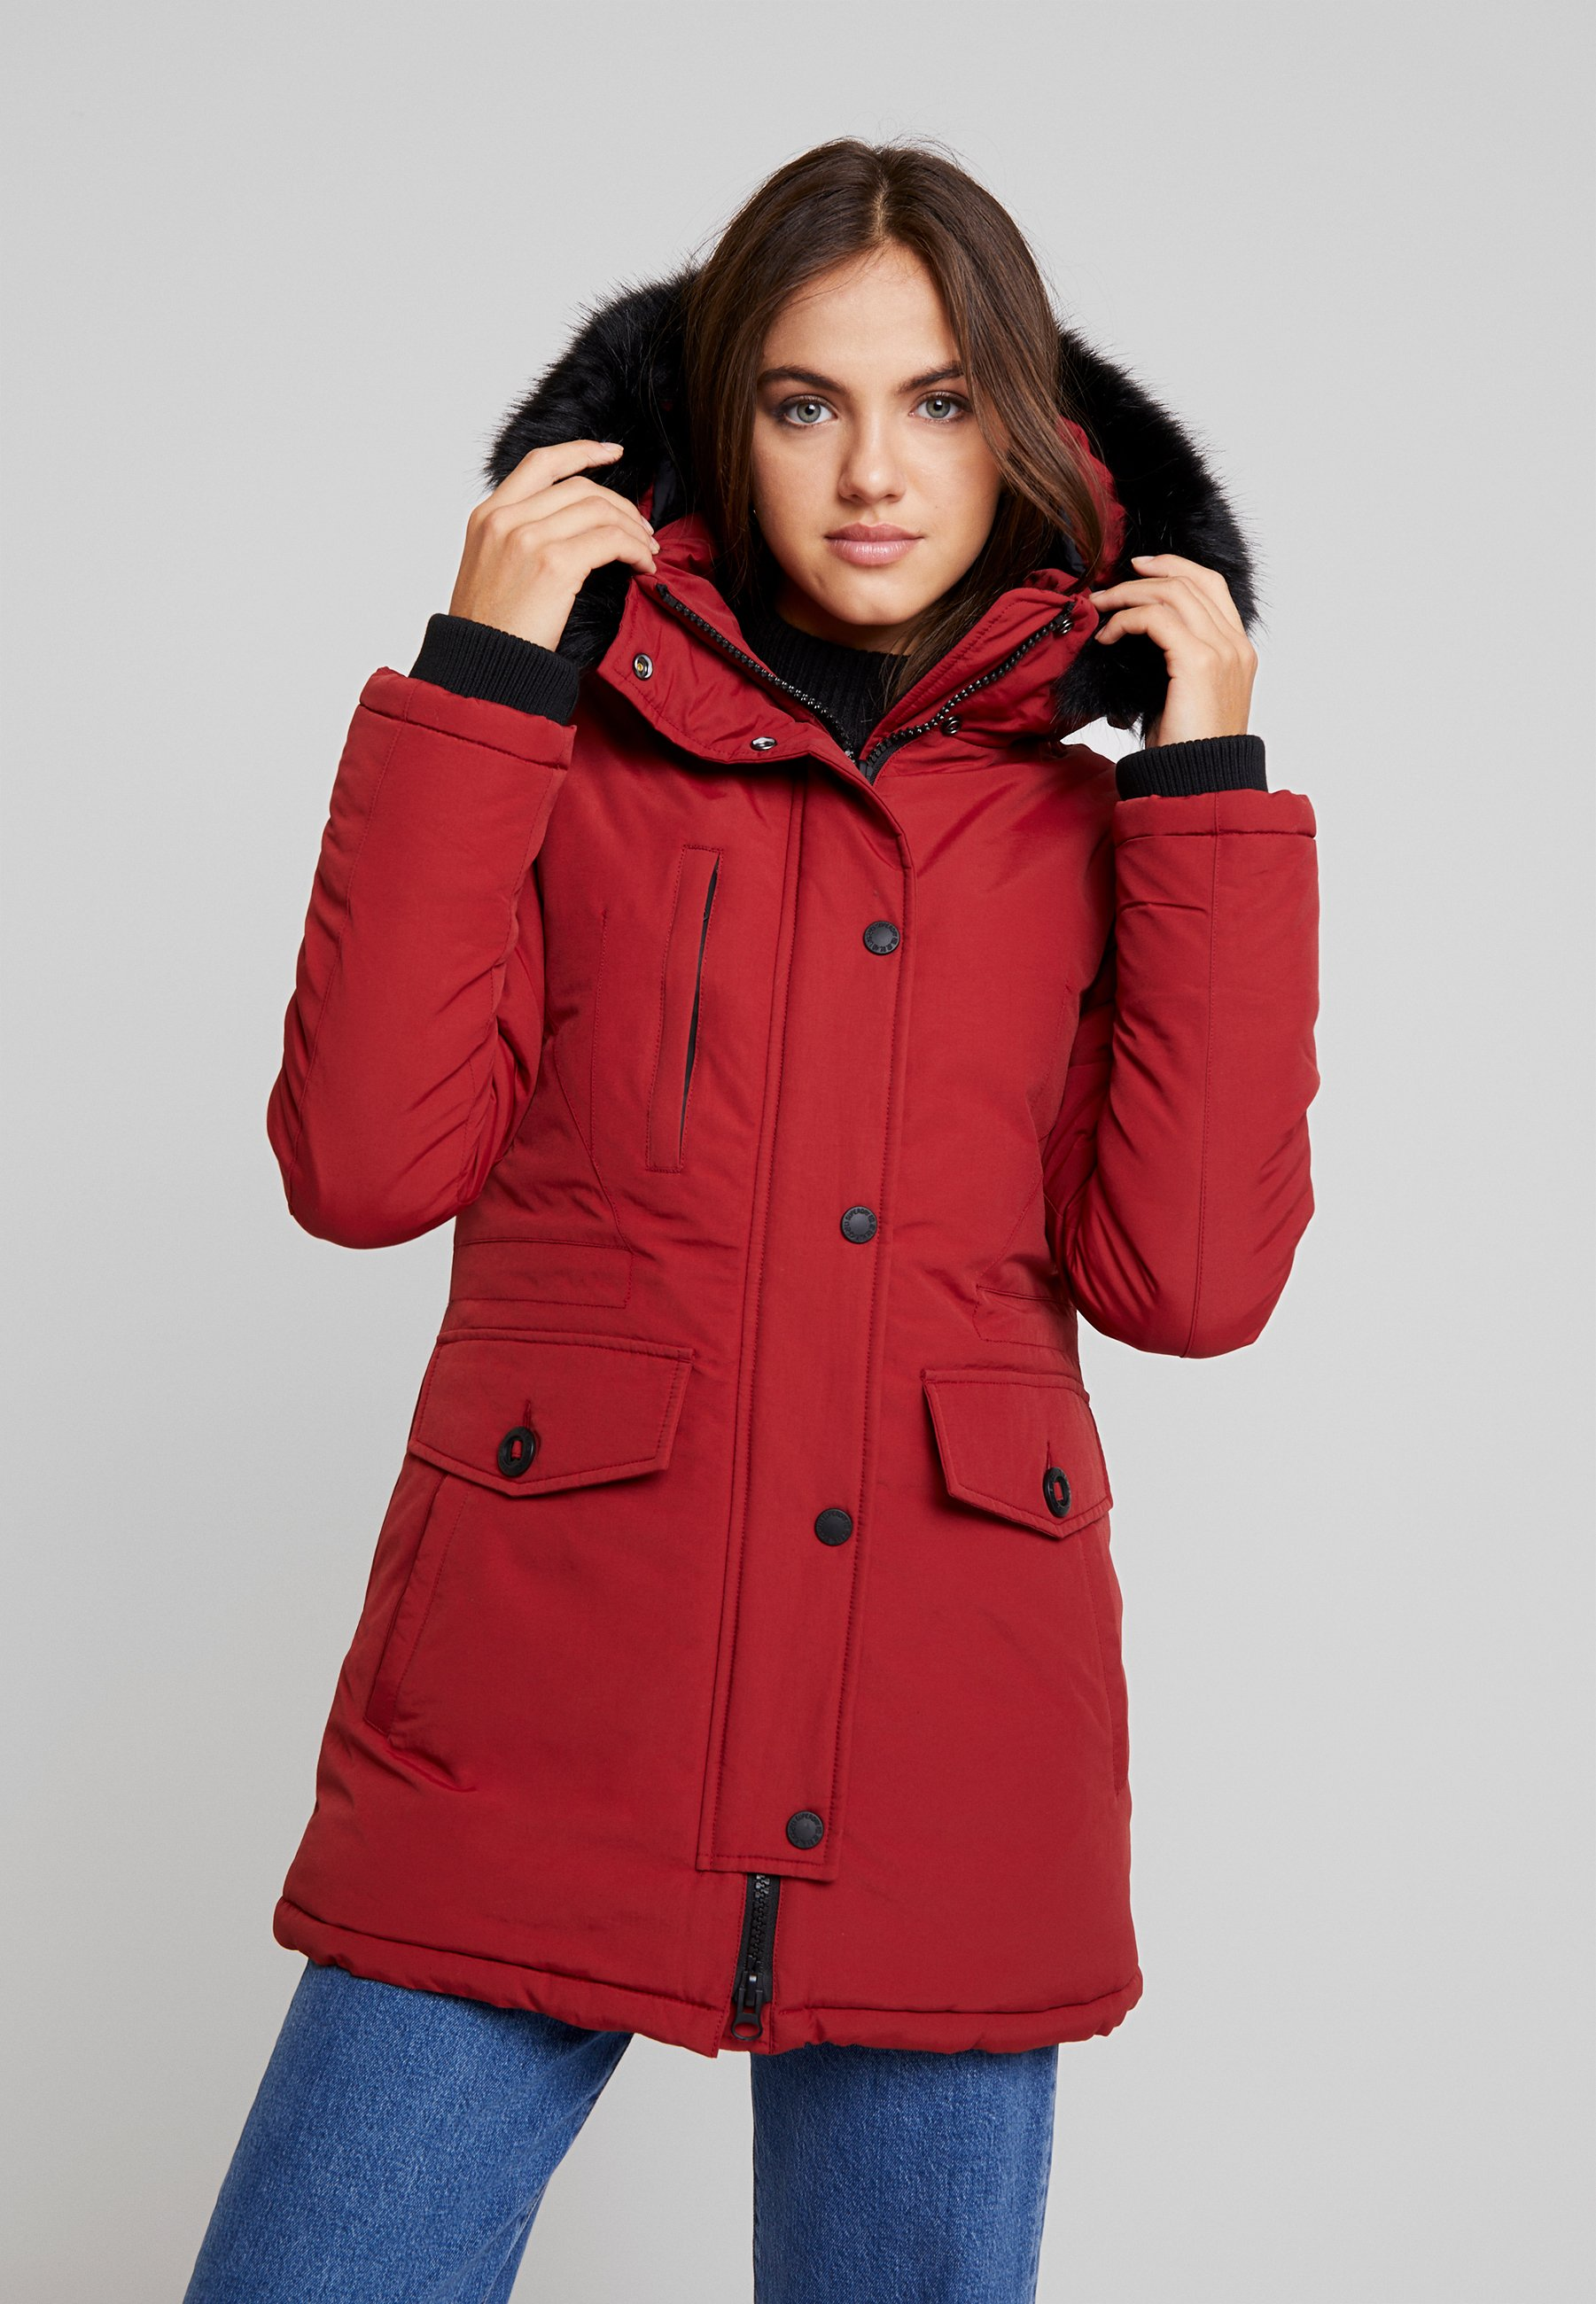 ASHLEY EVEREST   Wintermantel   brick red